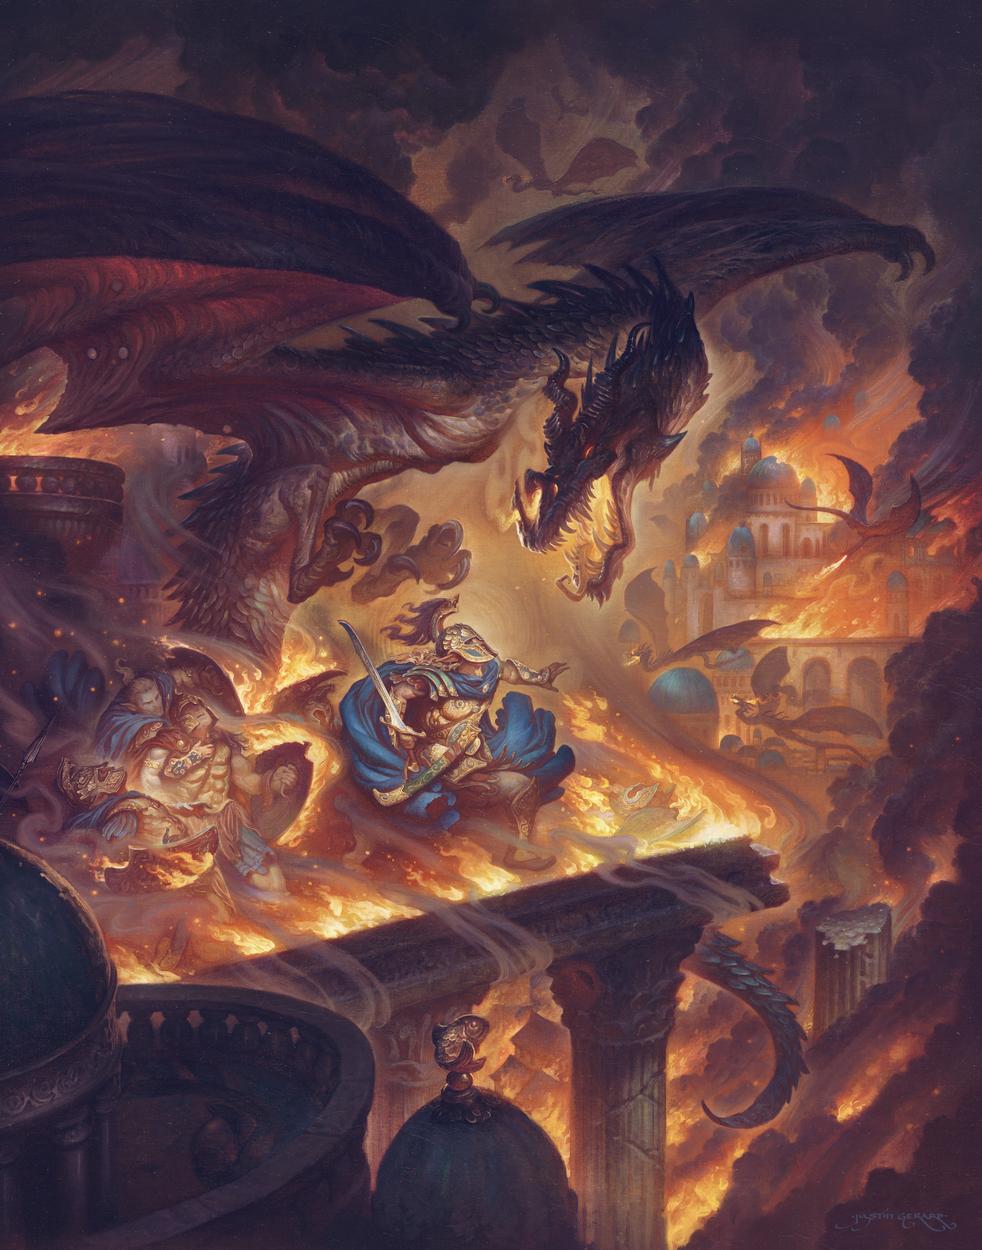 Fall of Gondolin Artwork by Justin Gerard